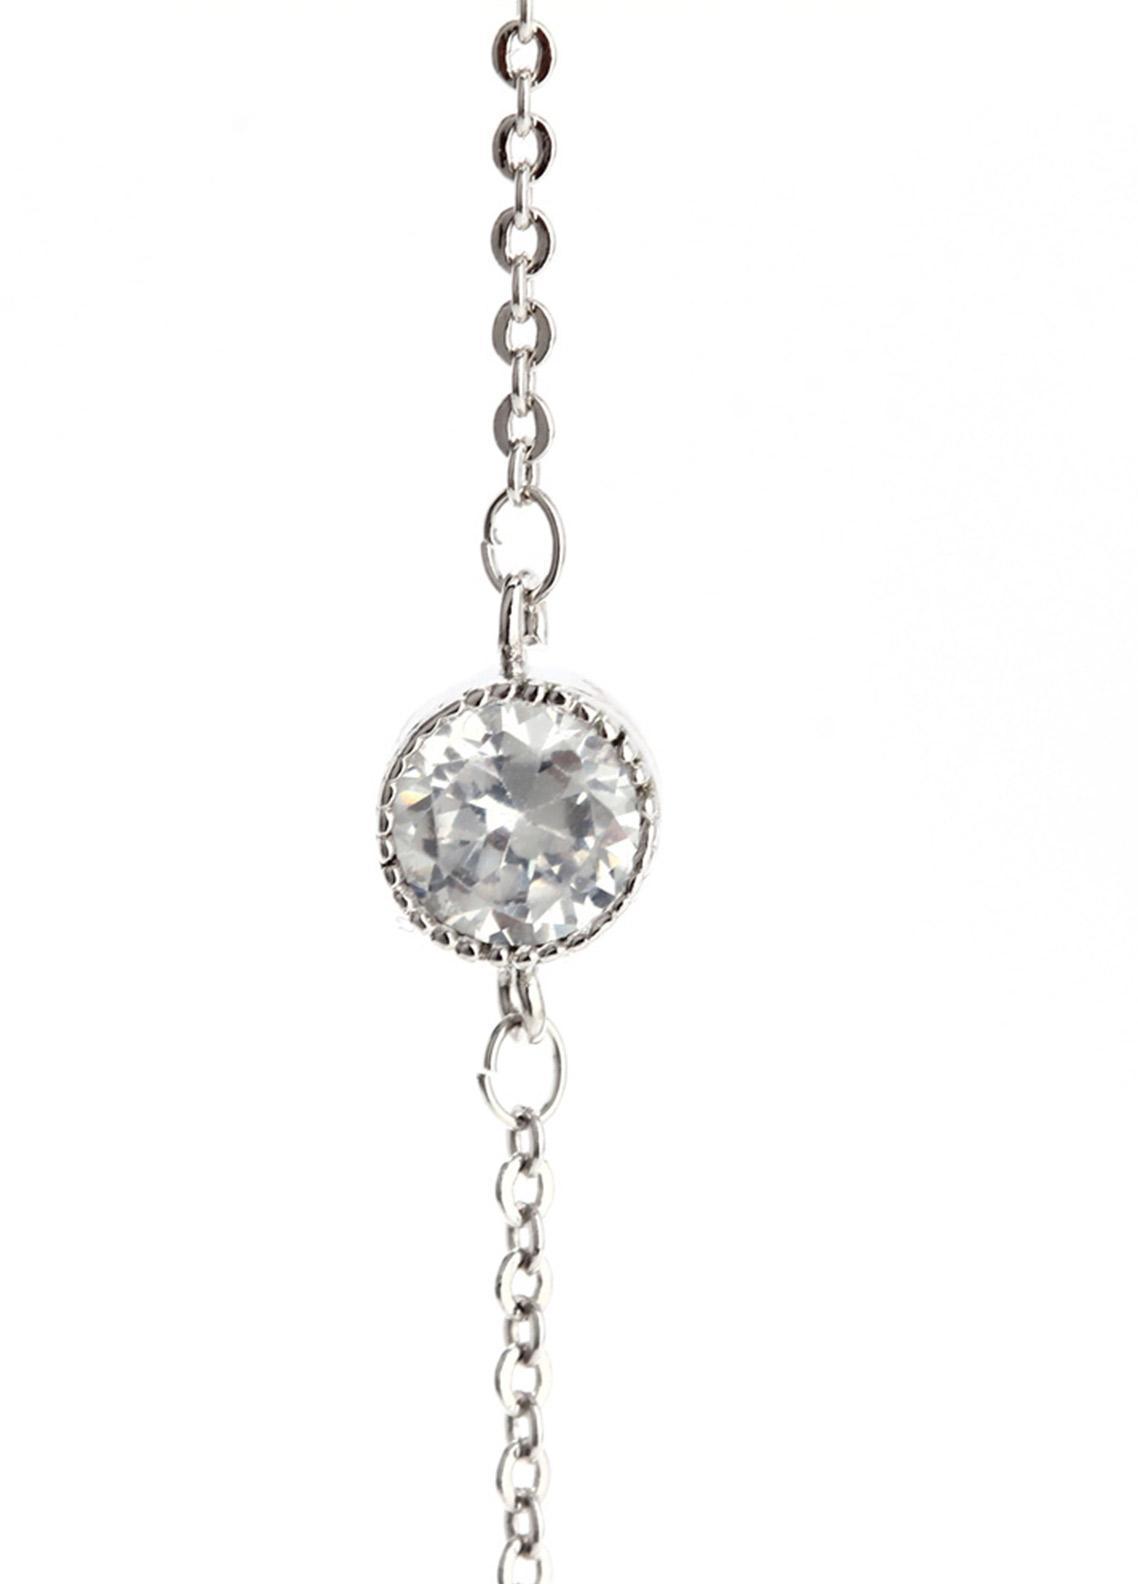 Anna Grace London Silver Crystal Sparkling Bracelet AGB0063 - Ladies Jewellery